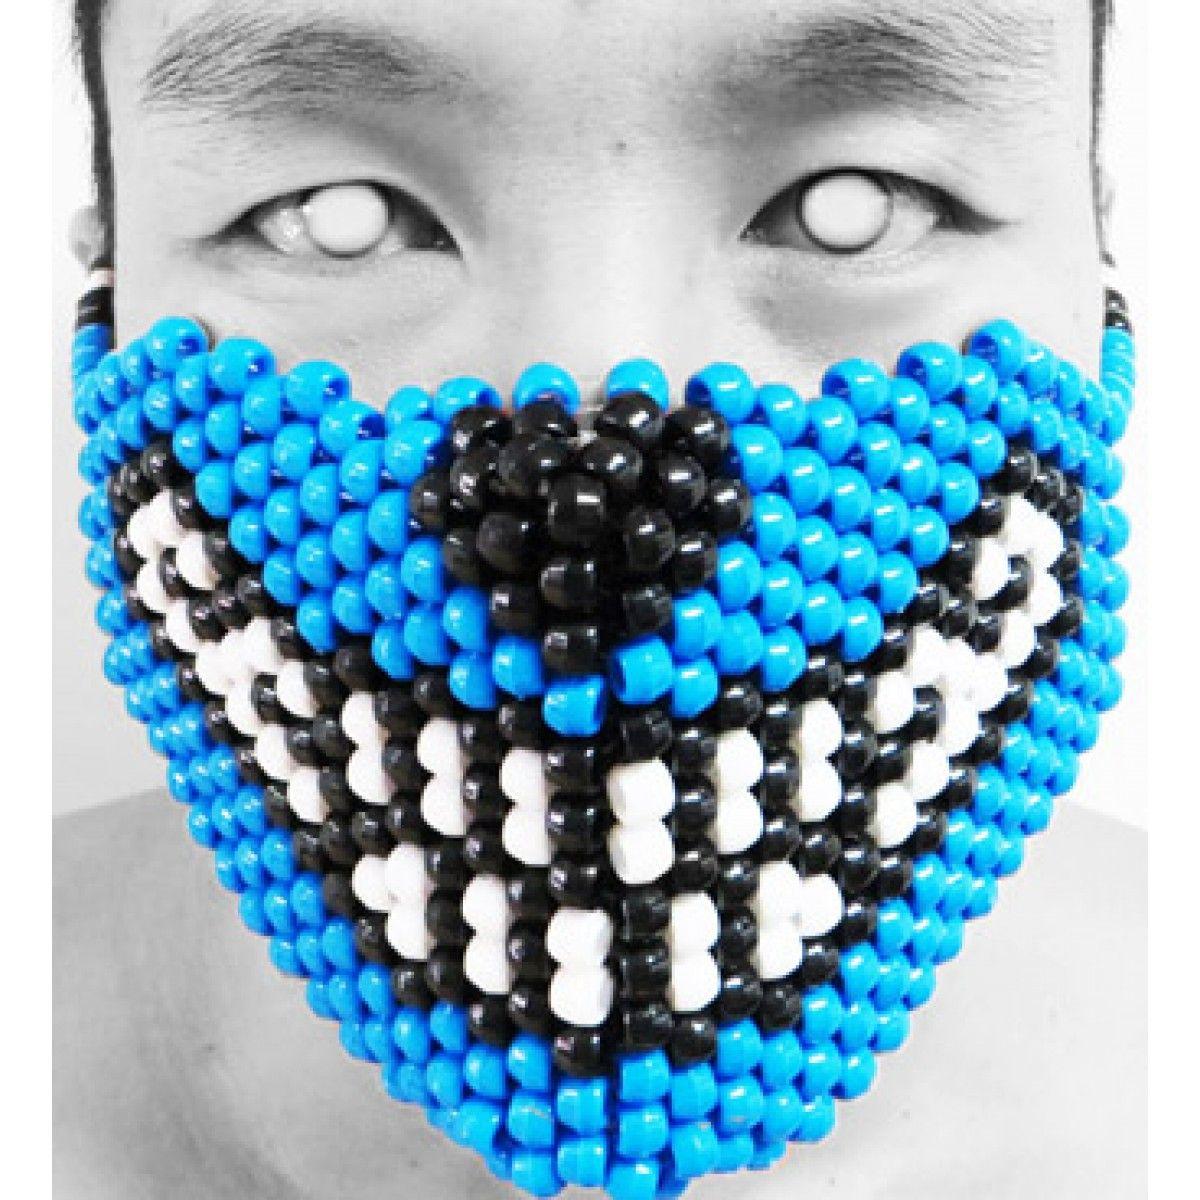 Big Bad Wolf Kandi Mask #bigbadwolf #plur #edm #electricdaisycarnival #edc #